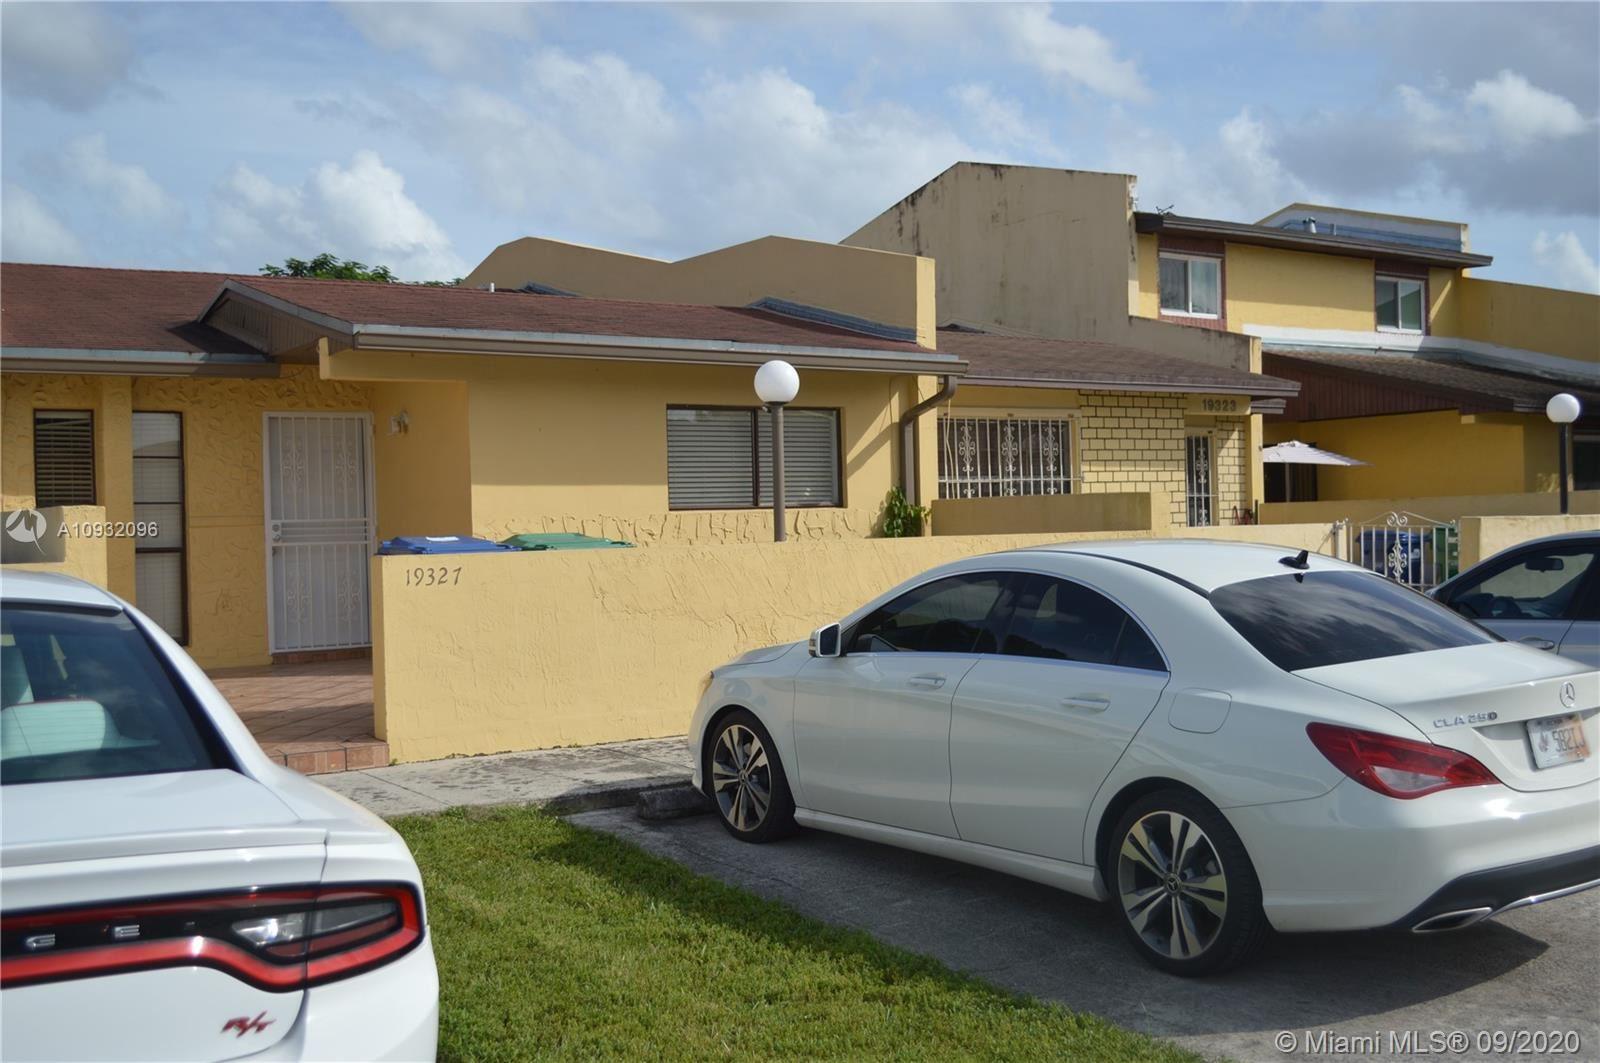 Miami Gardens, FL 33055